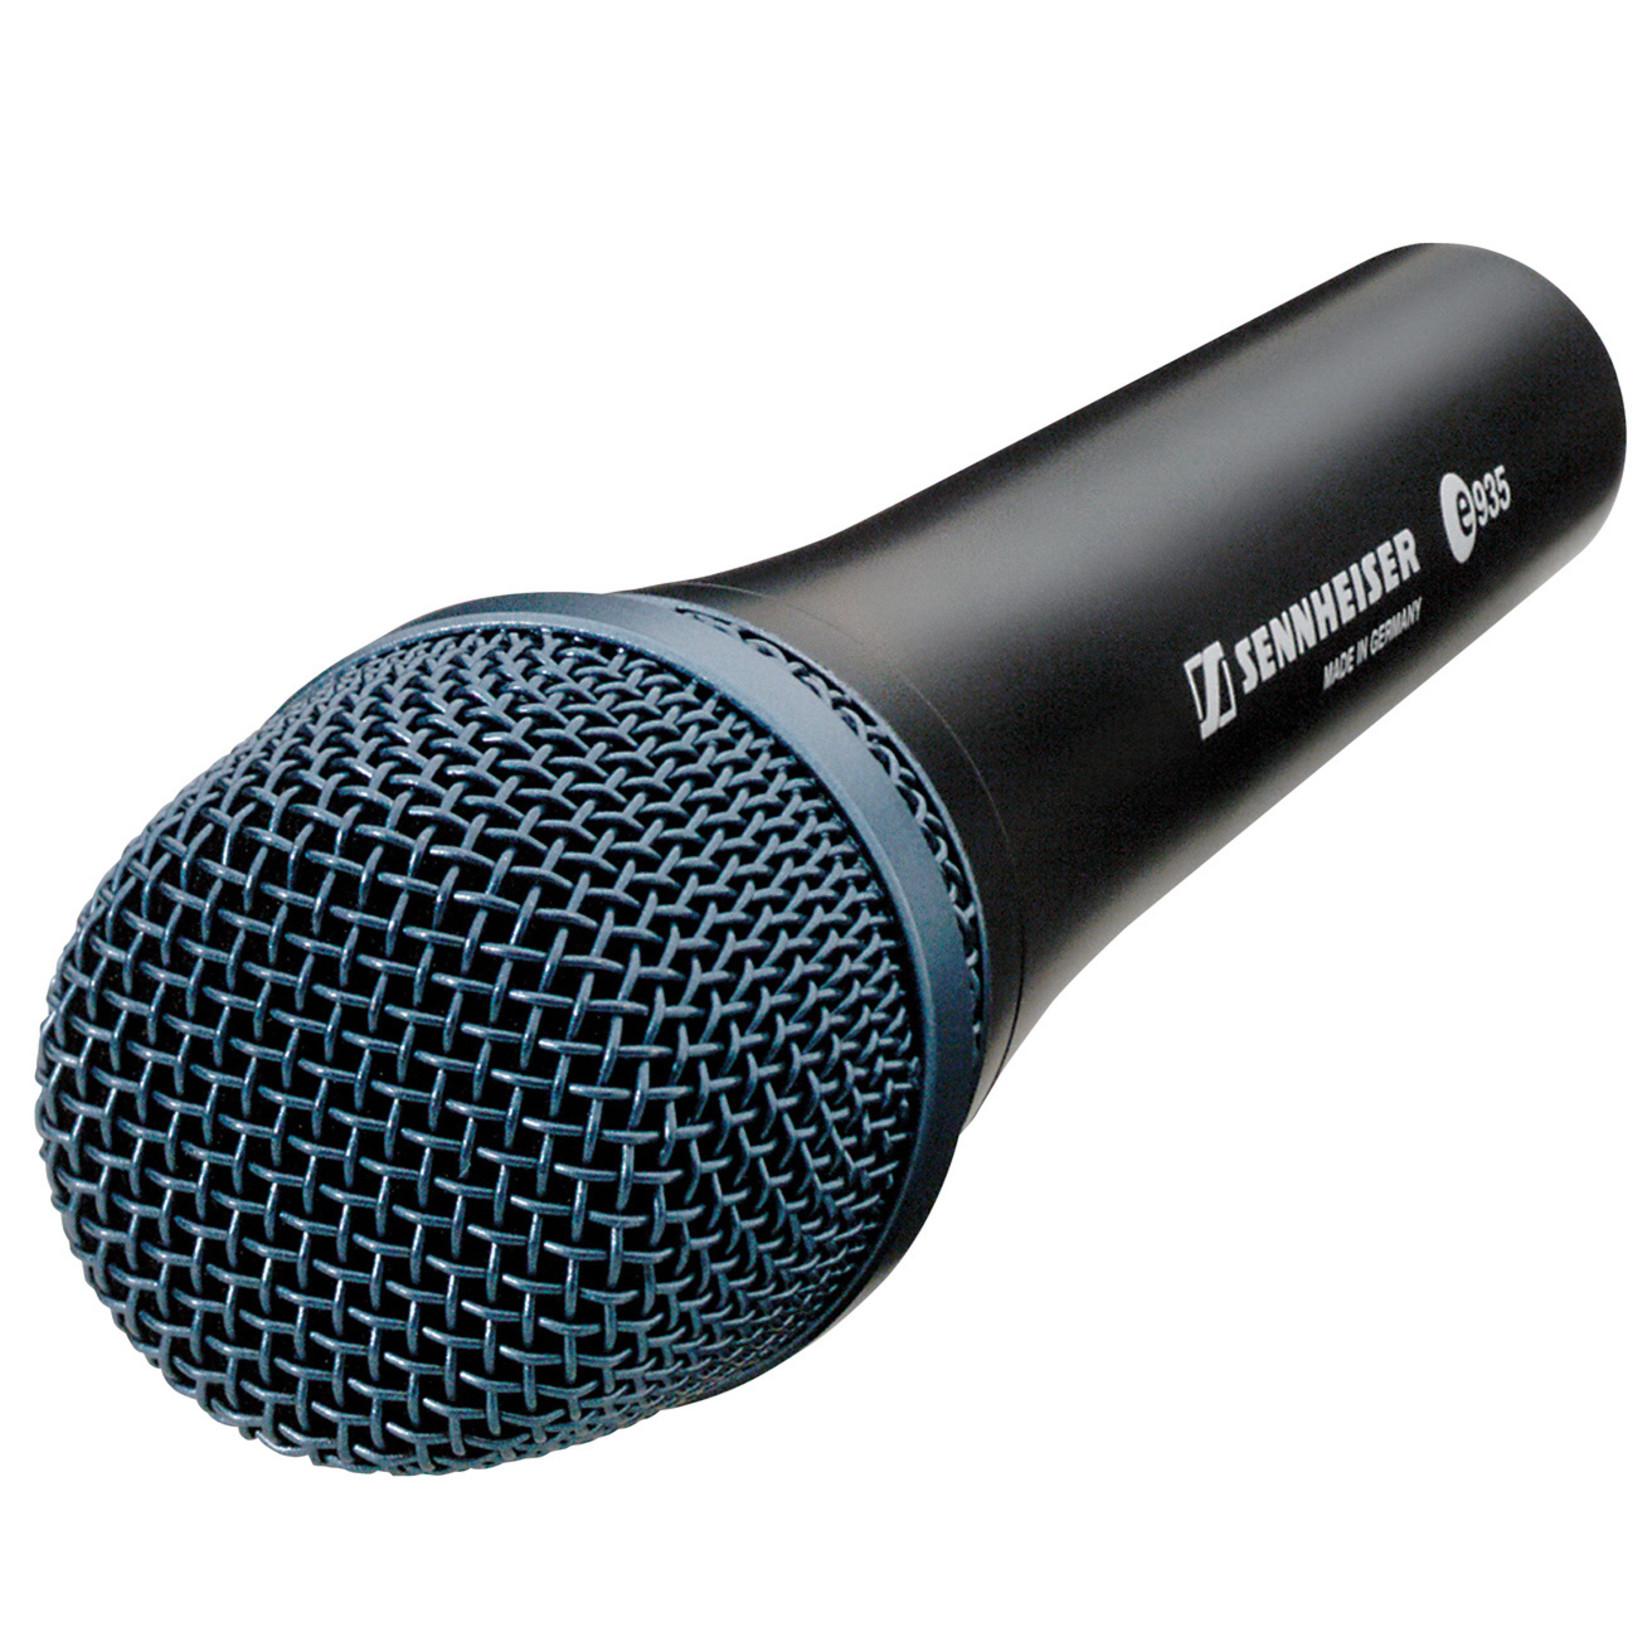 Sennheiser Sennheiser e935 Cardioid Handheld Dynamic Vocal Microphone